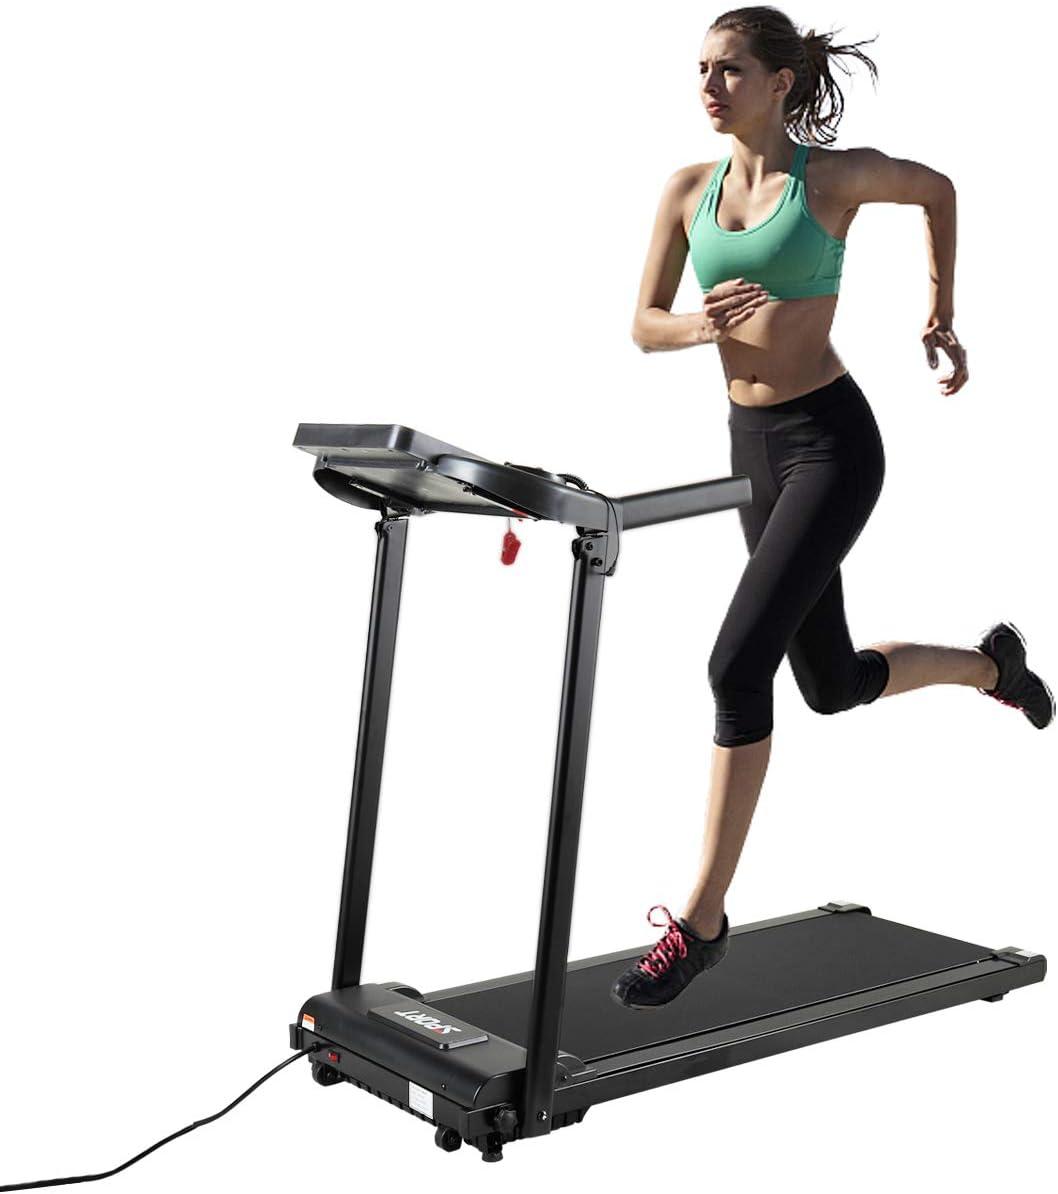 JAXPETY Electric Folding Treadmill 2.0HP Fitness Motorized Running Jogging Machine